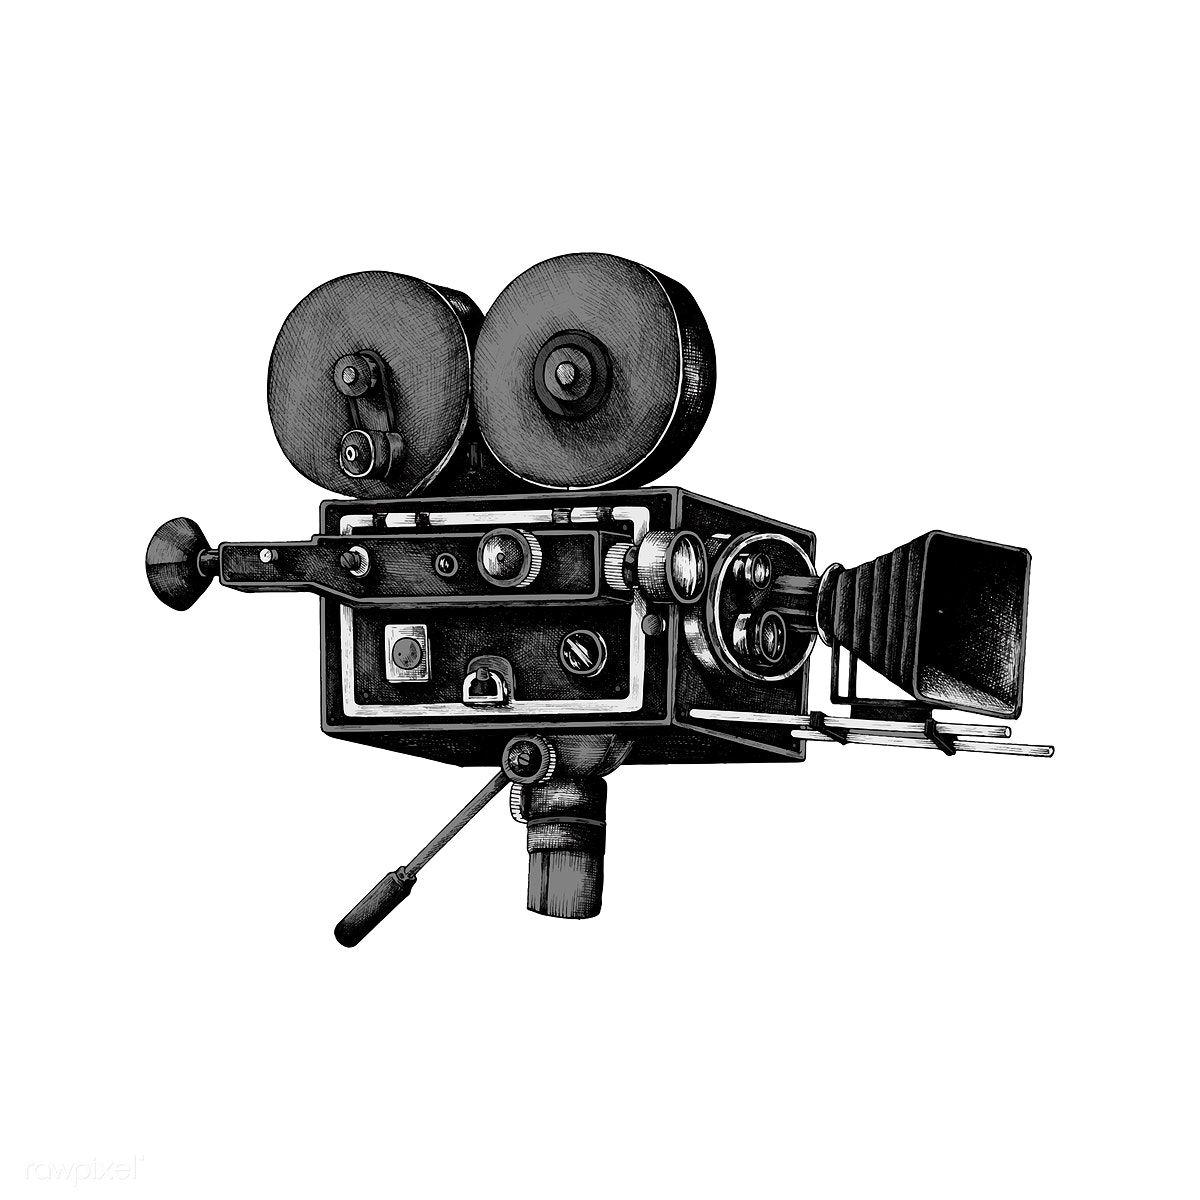 Download Premium Vector Of Hand Drawn Retro Movie Camera 410673 In 2020 Camera Illustration How To Draw Hands Movie Camera